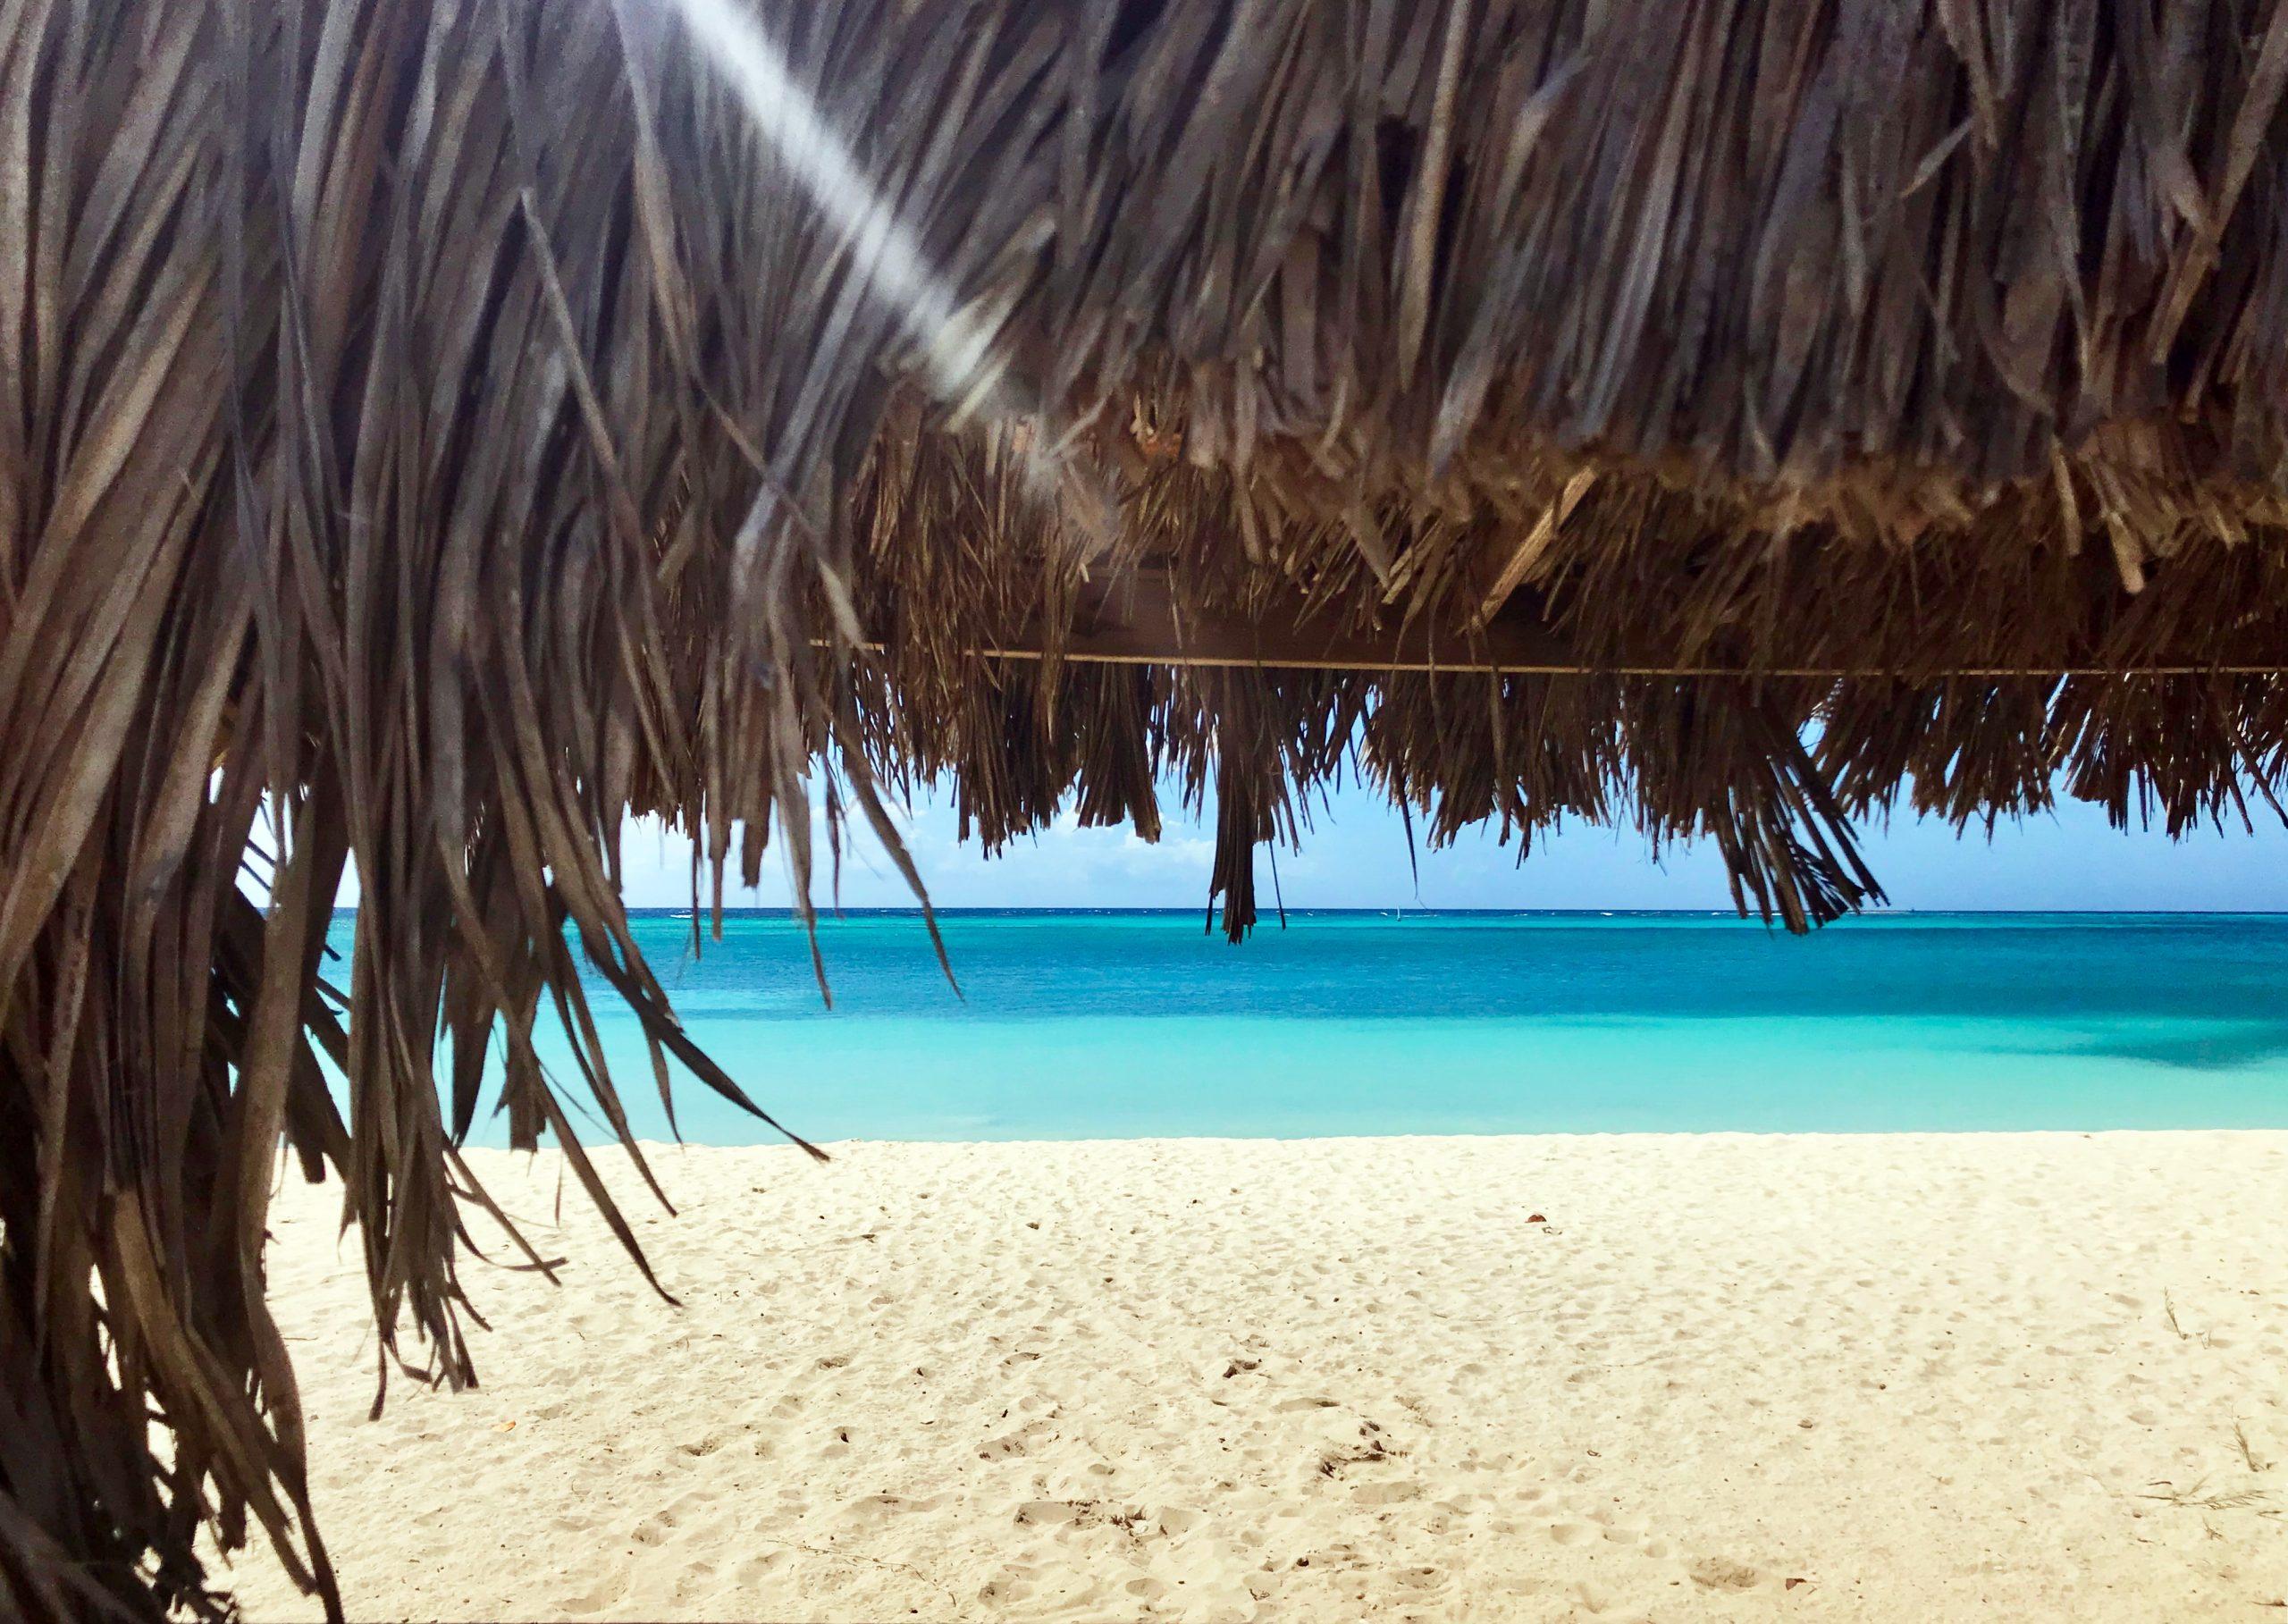 rodgers beach aruba palapa ocean